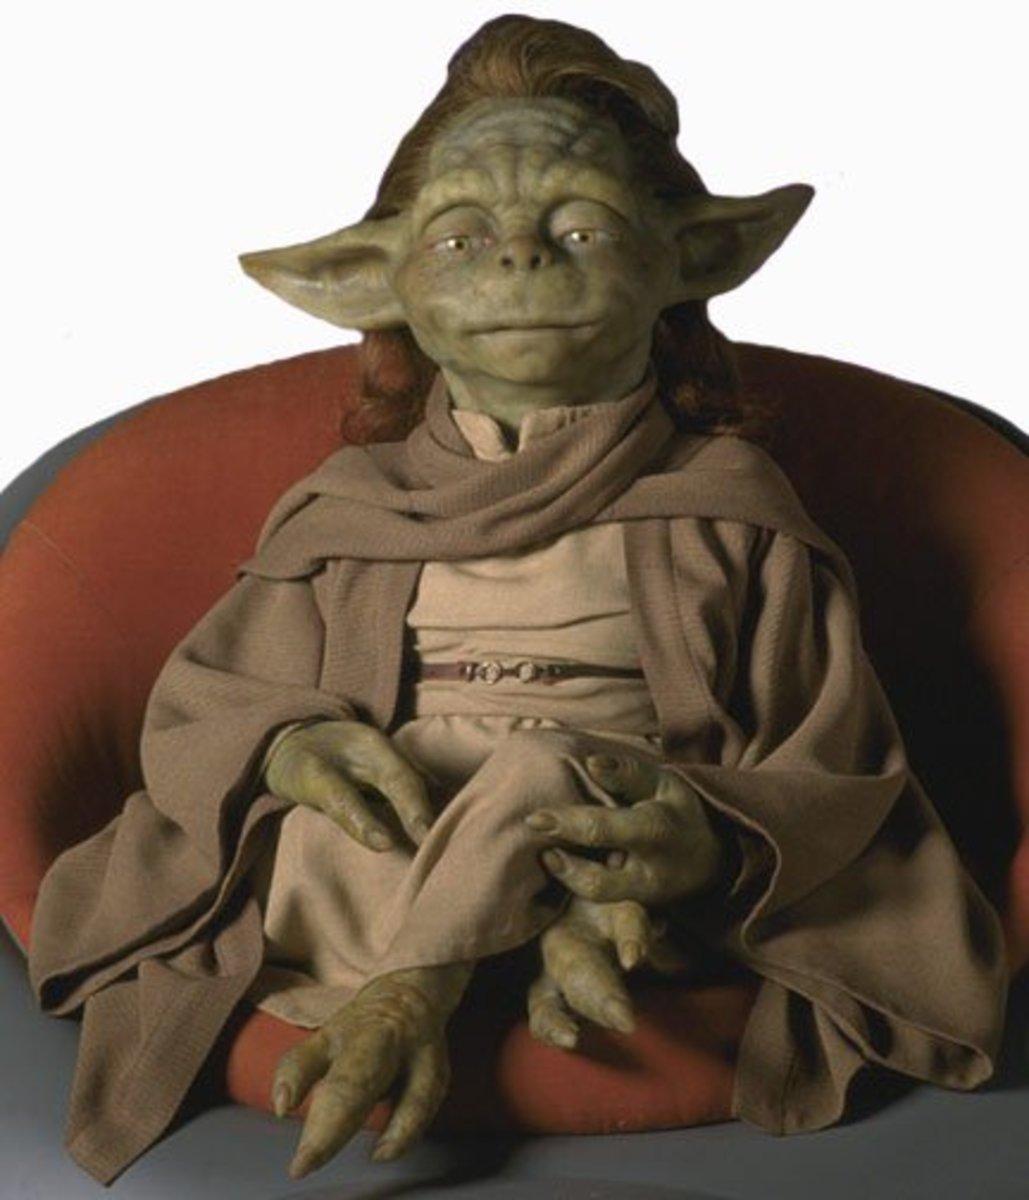 Jedi Master Yaddle